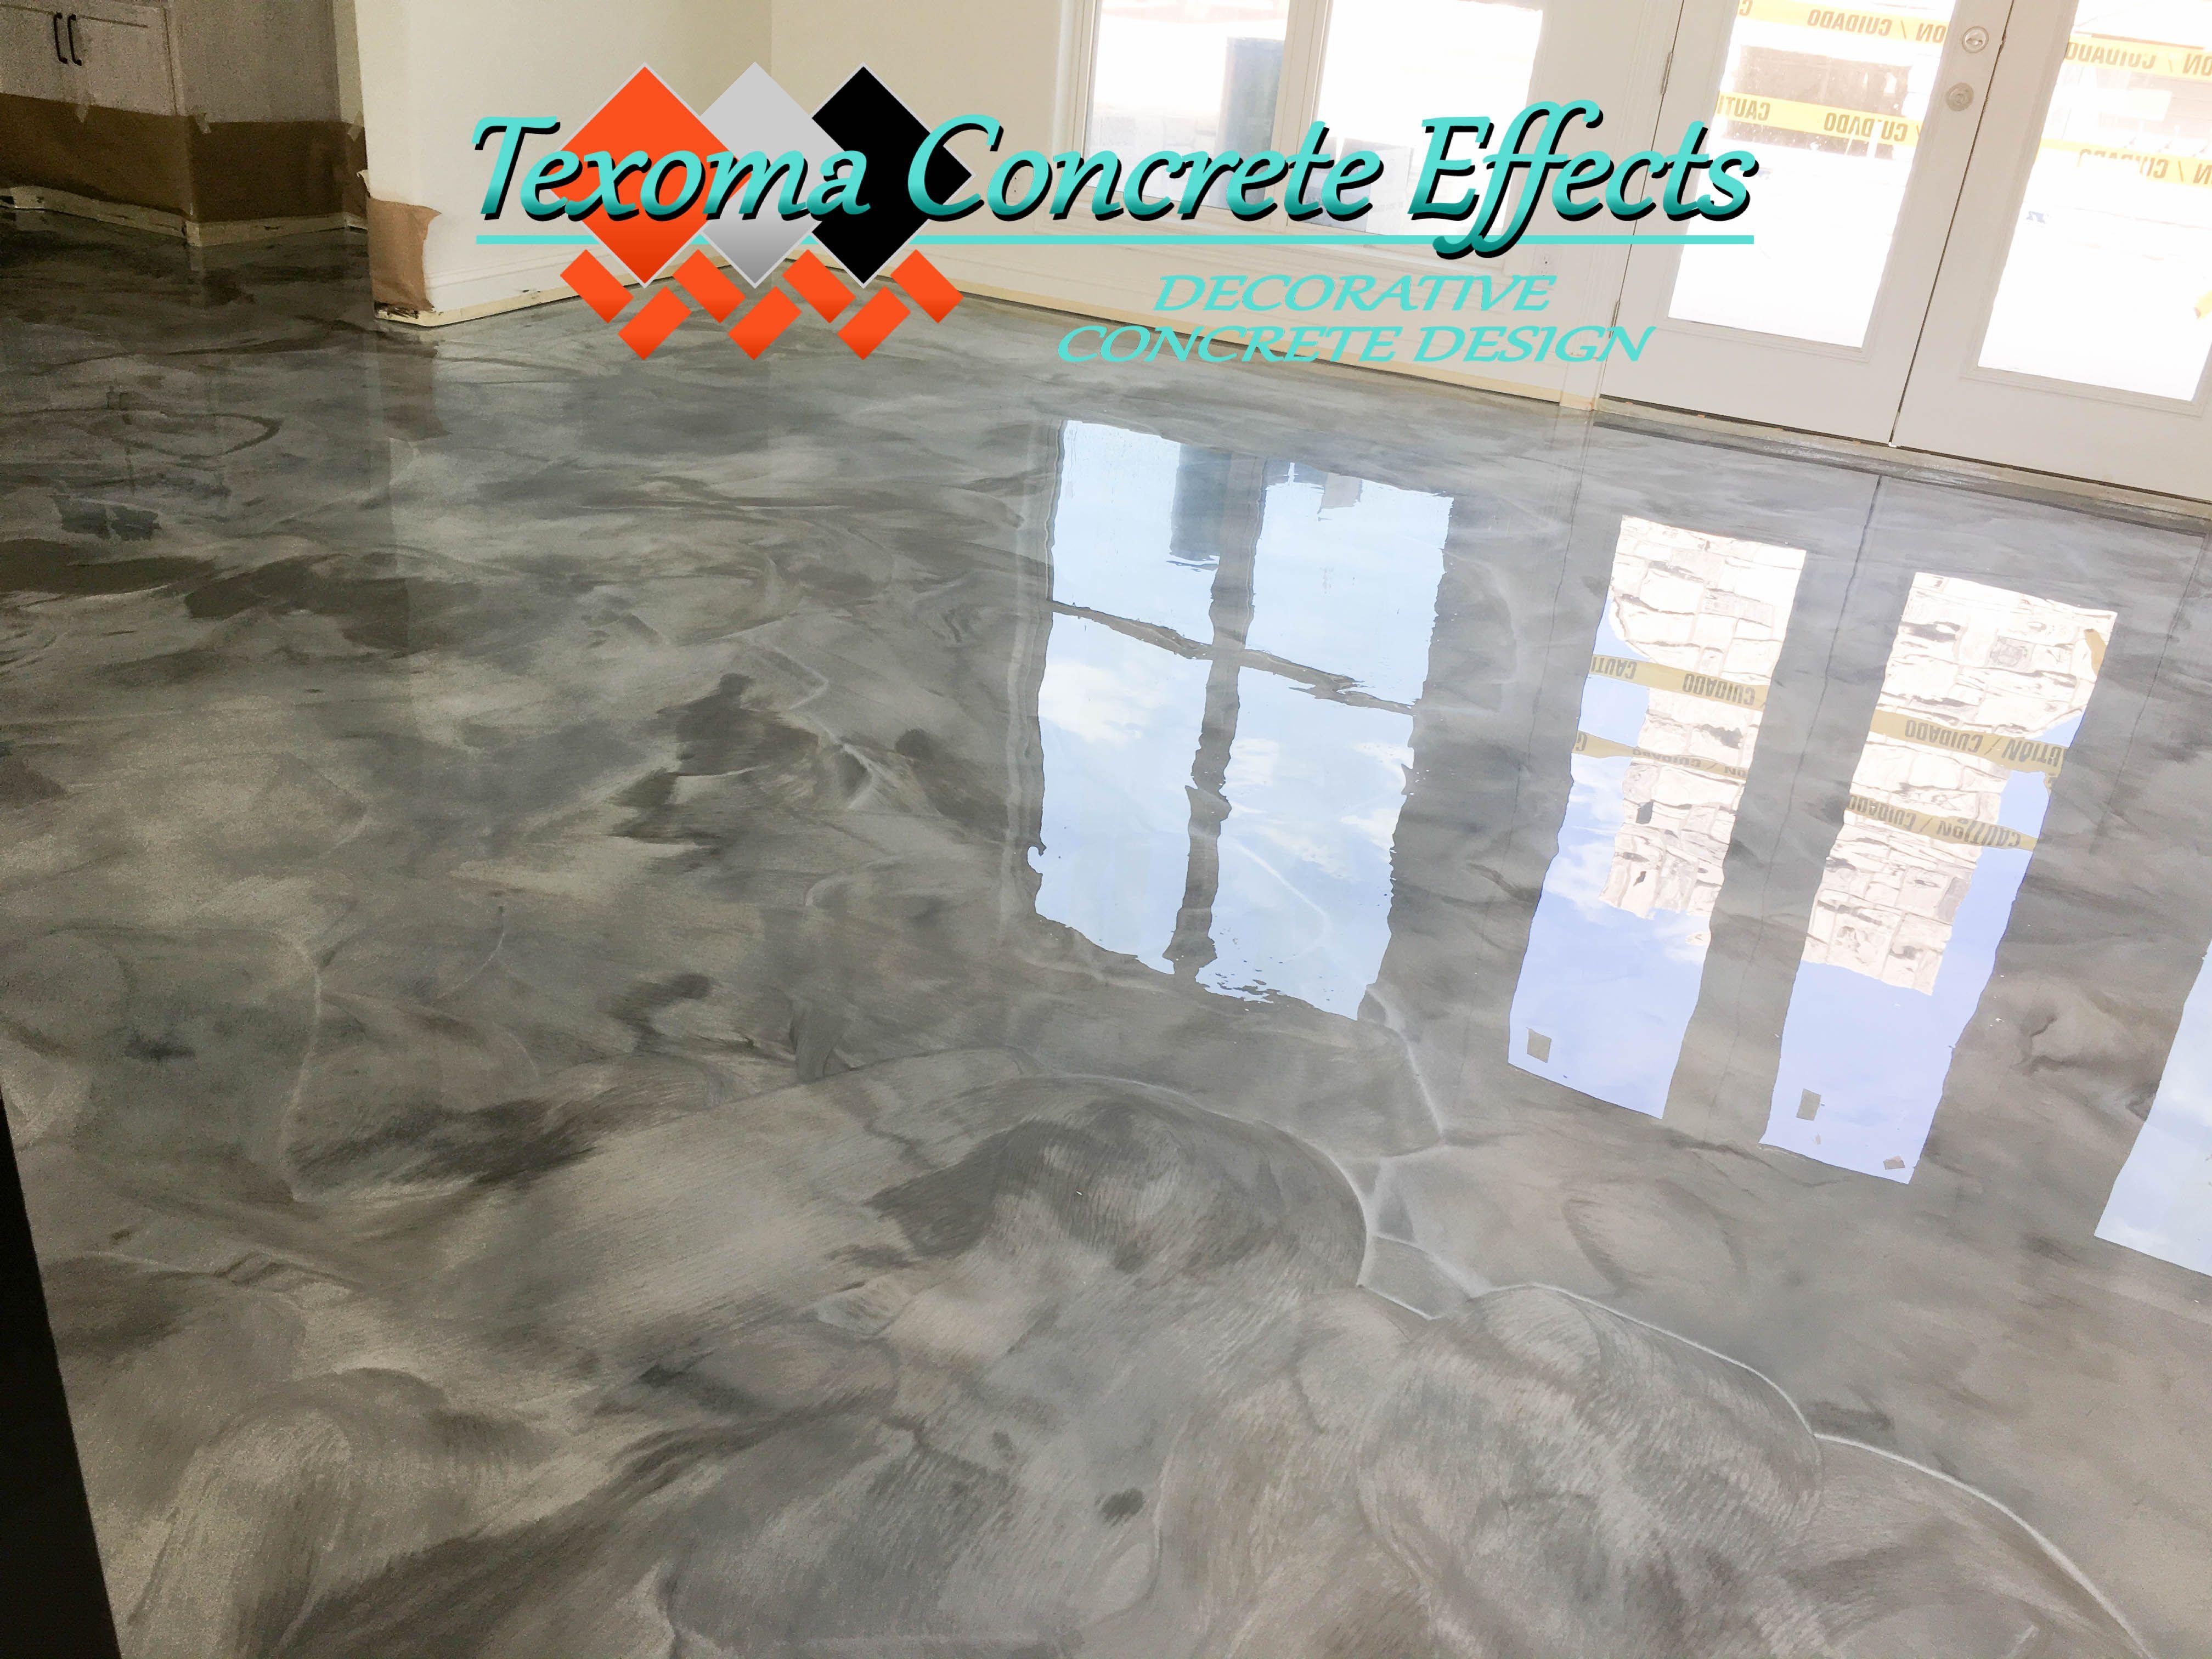 Metallic Epoxy Floor In Pool House By Texoma Concrete Effects Iowa Park Tx Metallic Epoxy Floor Epoxy Floor Iowa Park